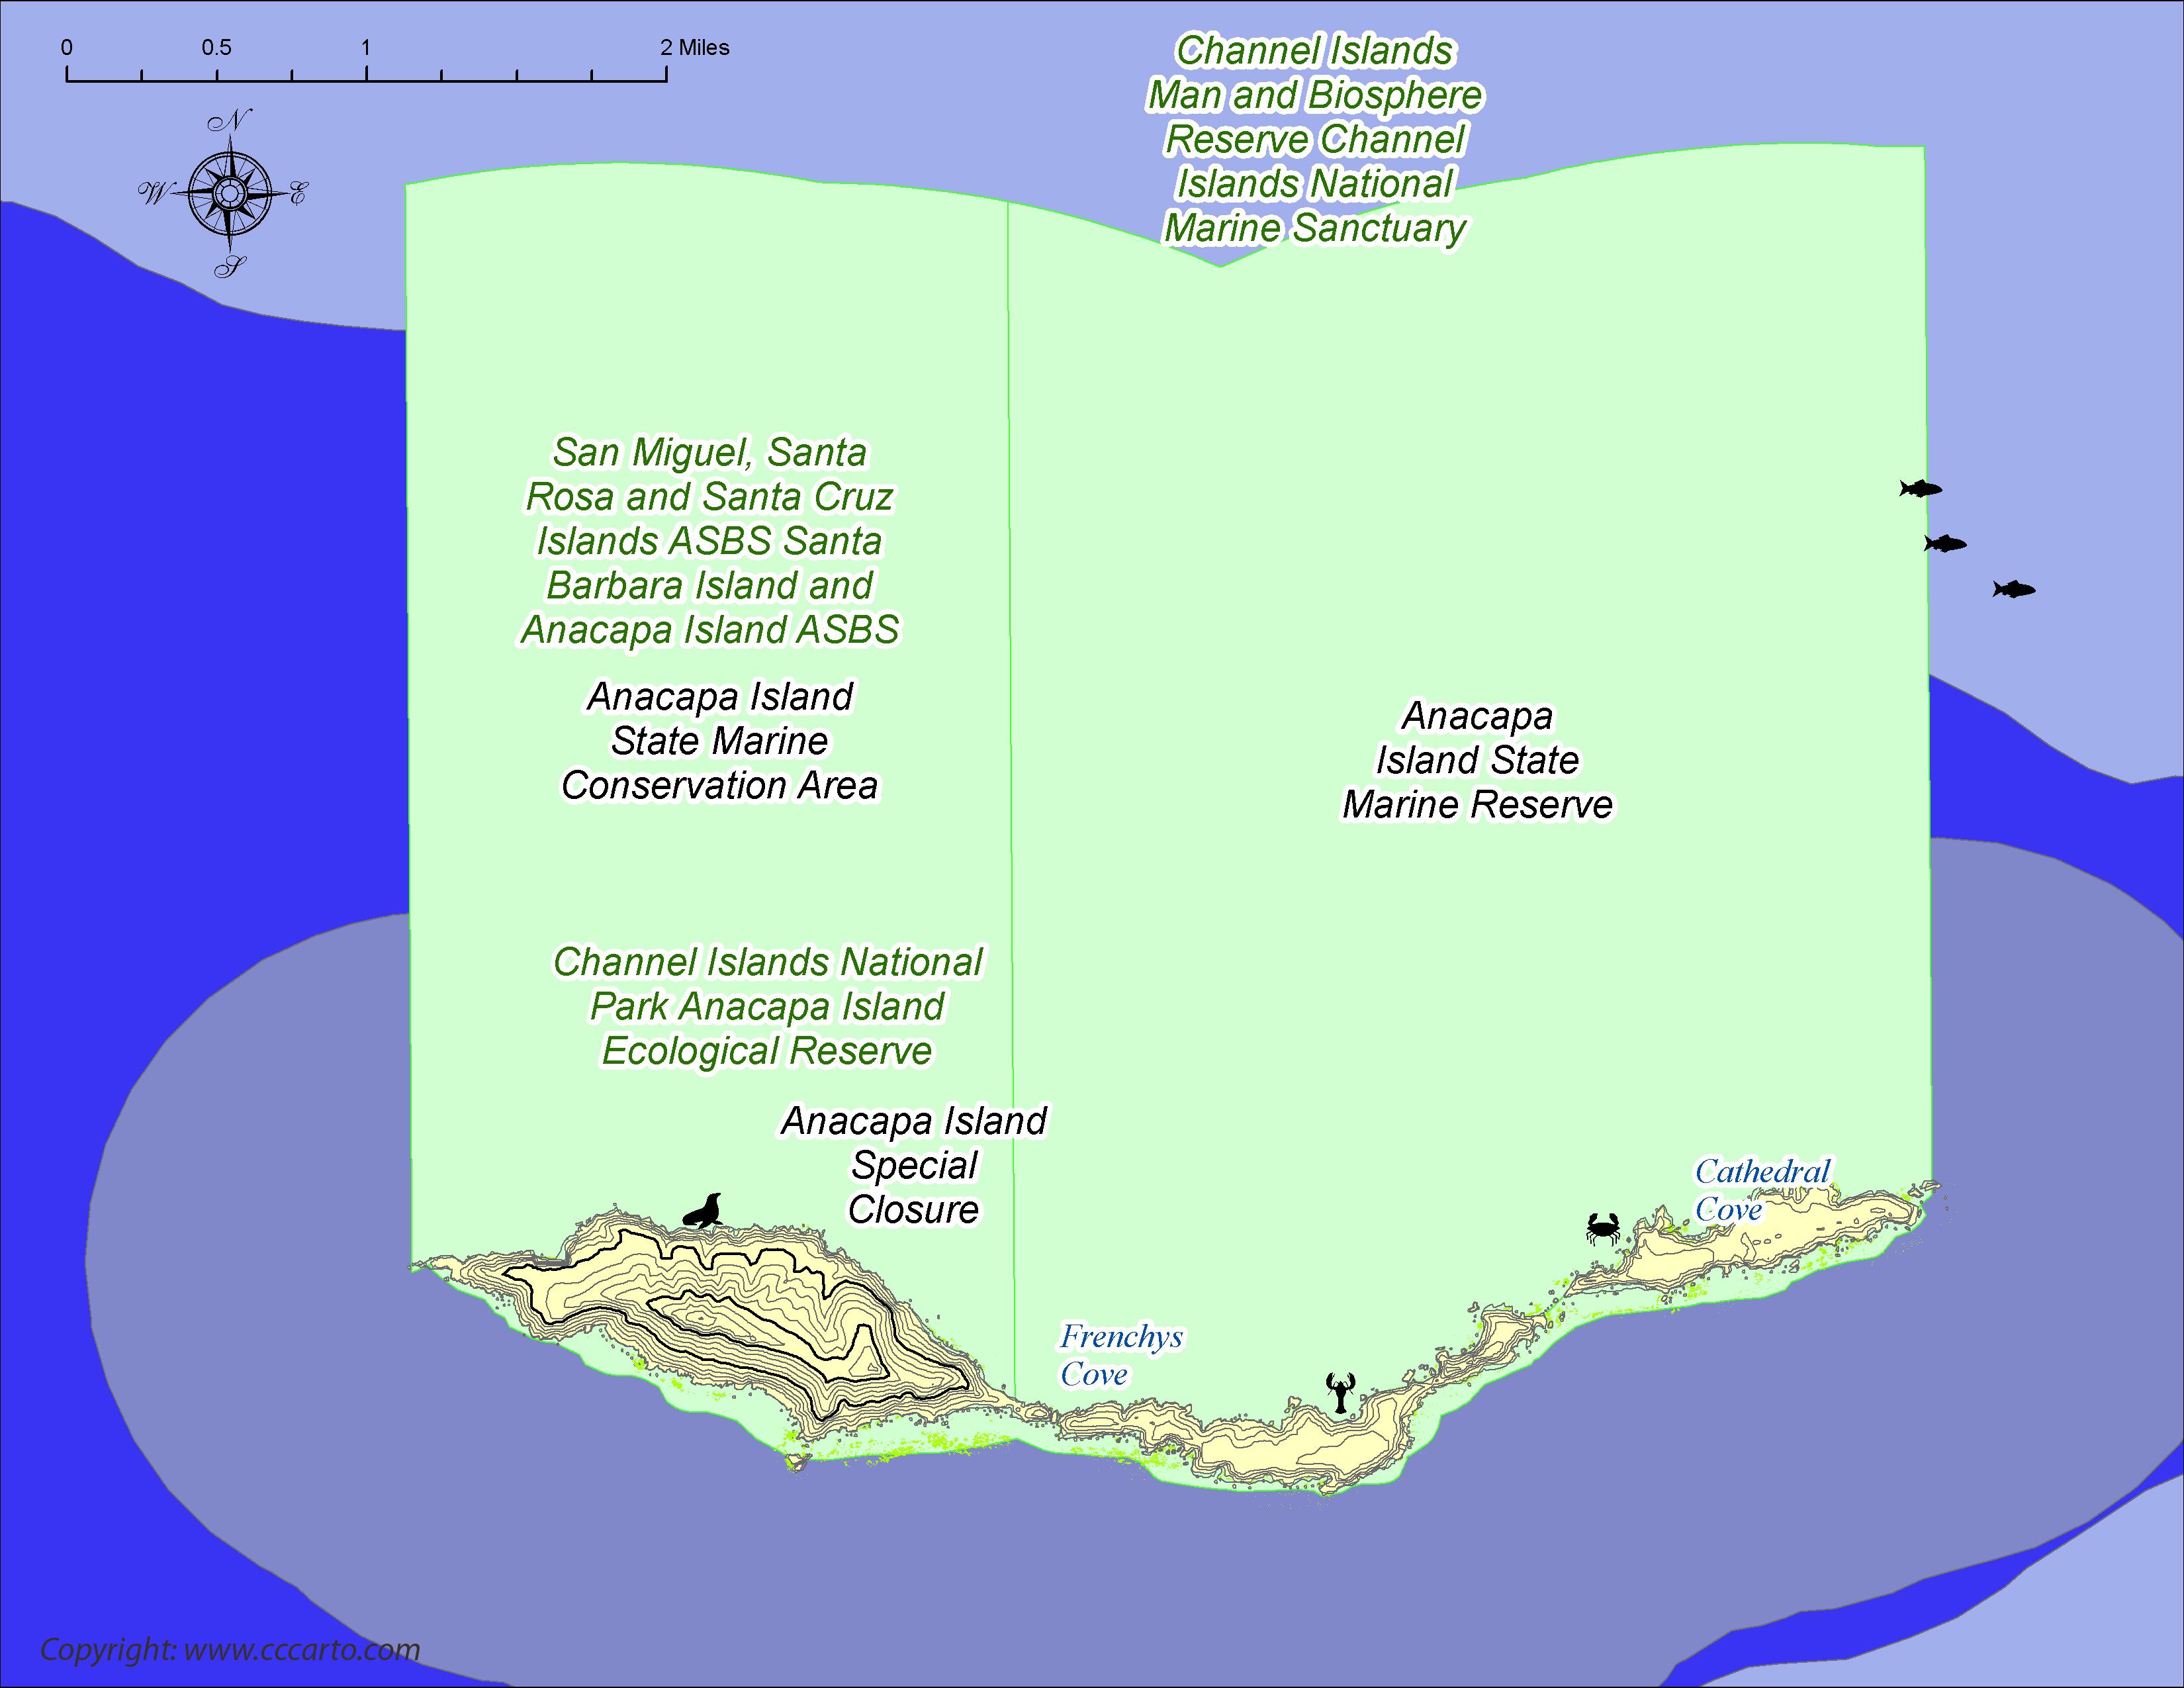 Anacapa Island Kayaking Area Reserves